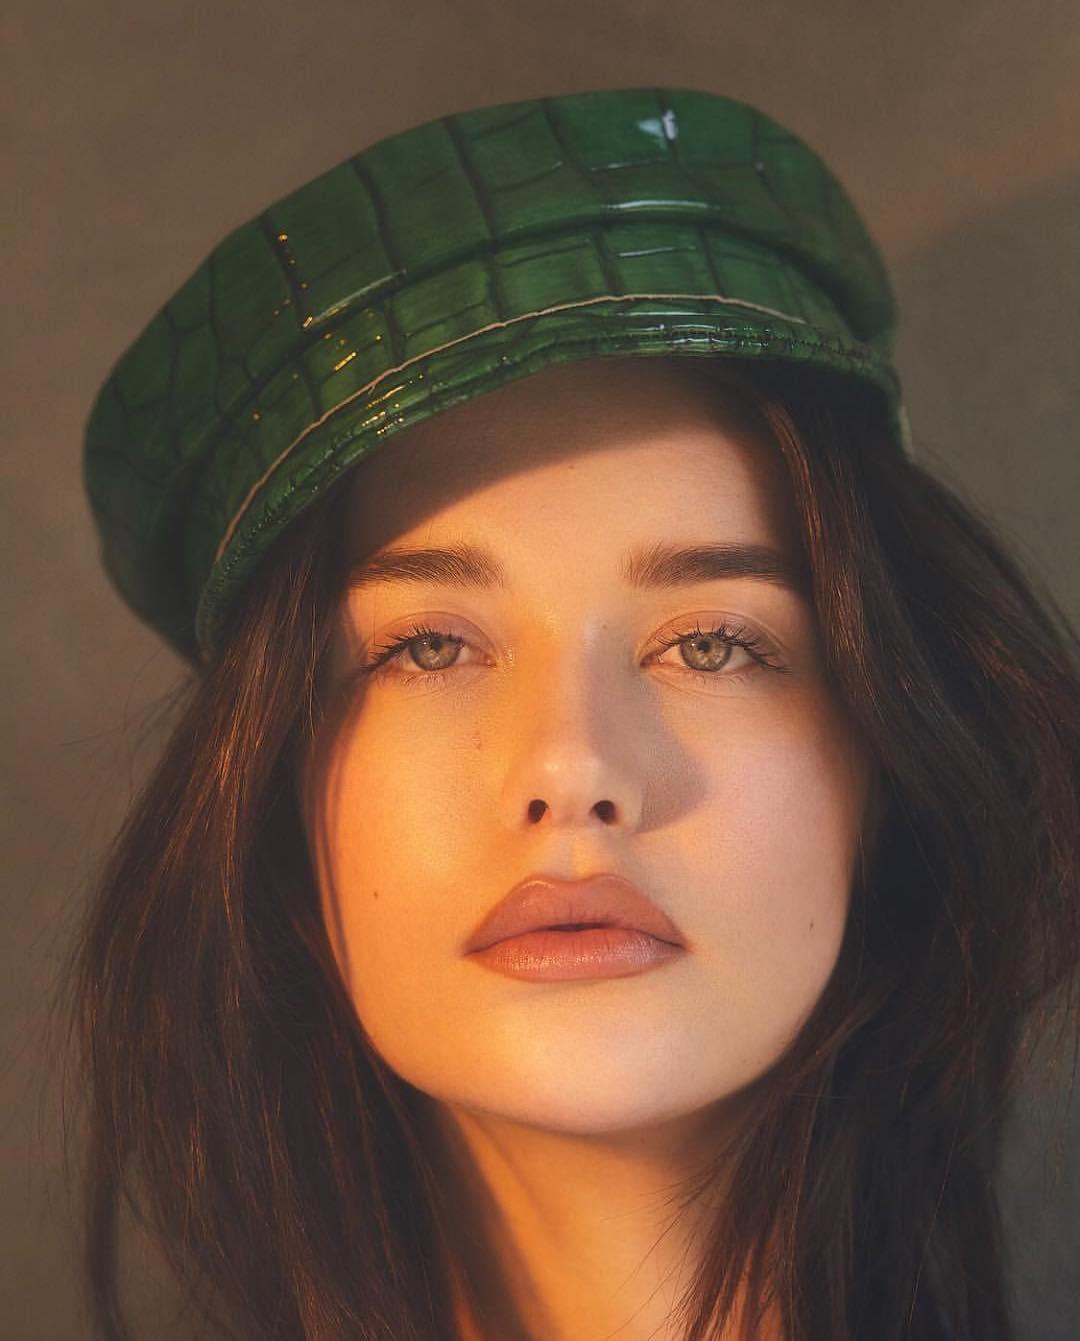 Amanda-Steele-4